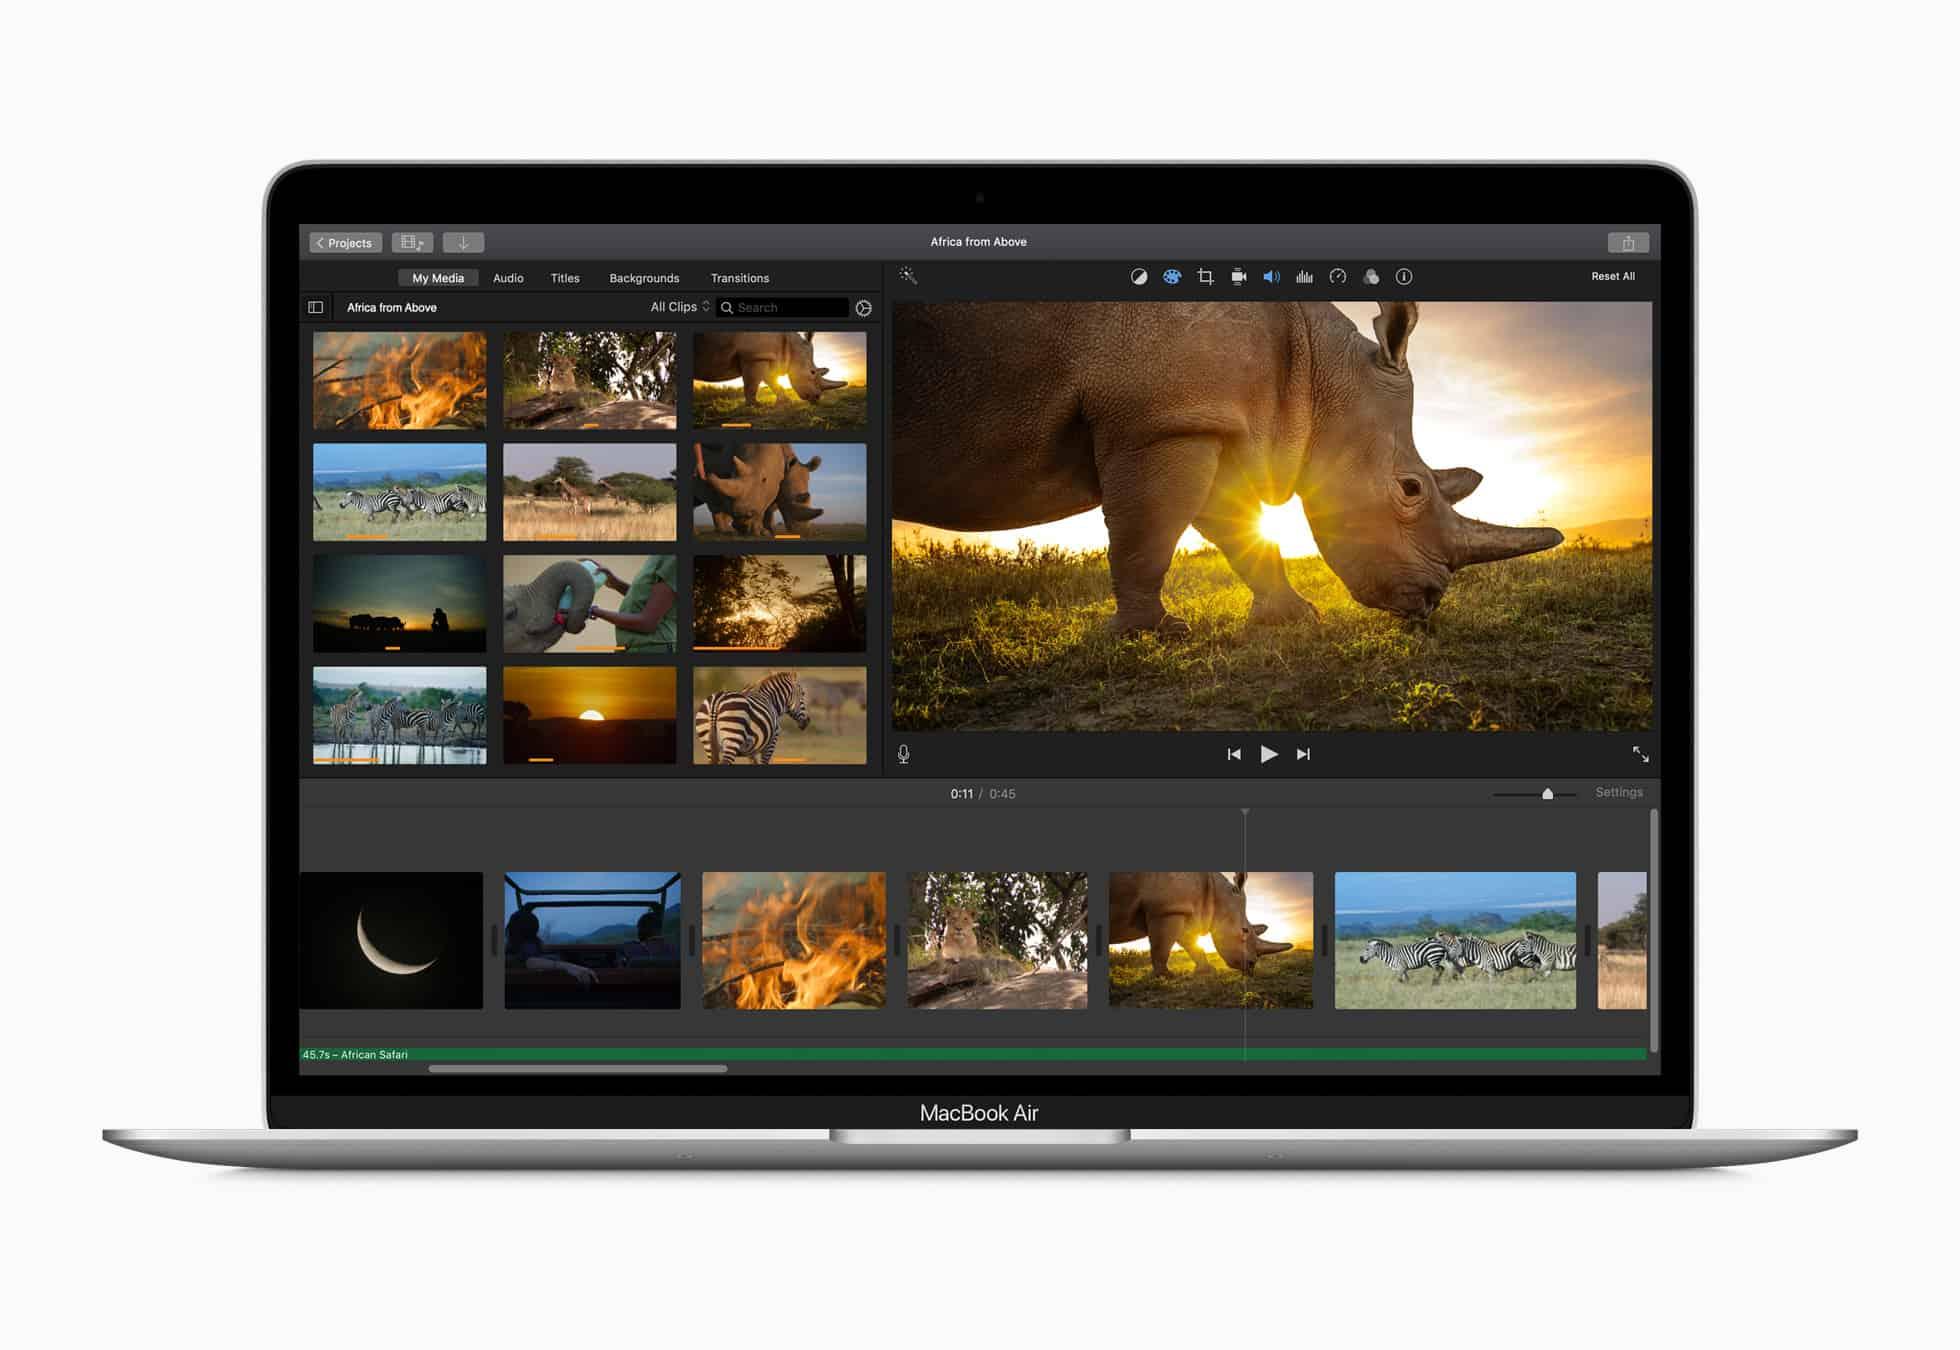 Apple_new-macbook-air-2020-performance-laptopvang-com_